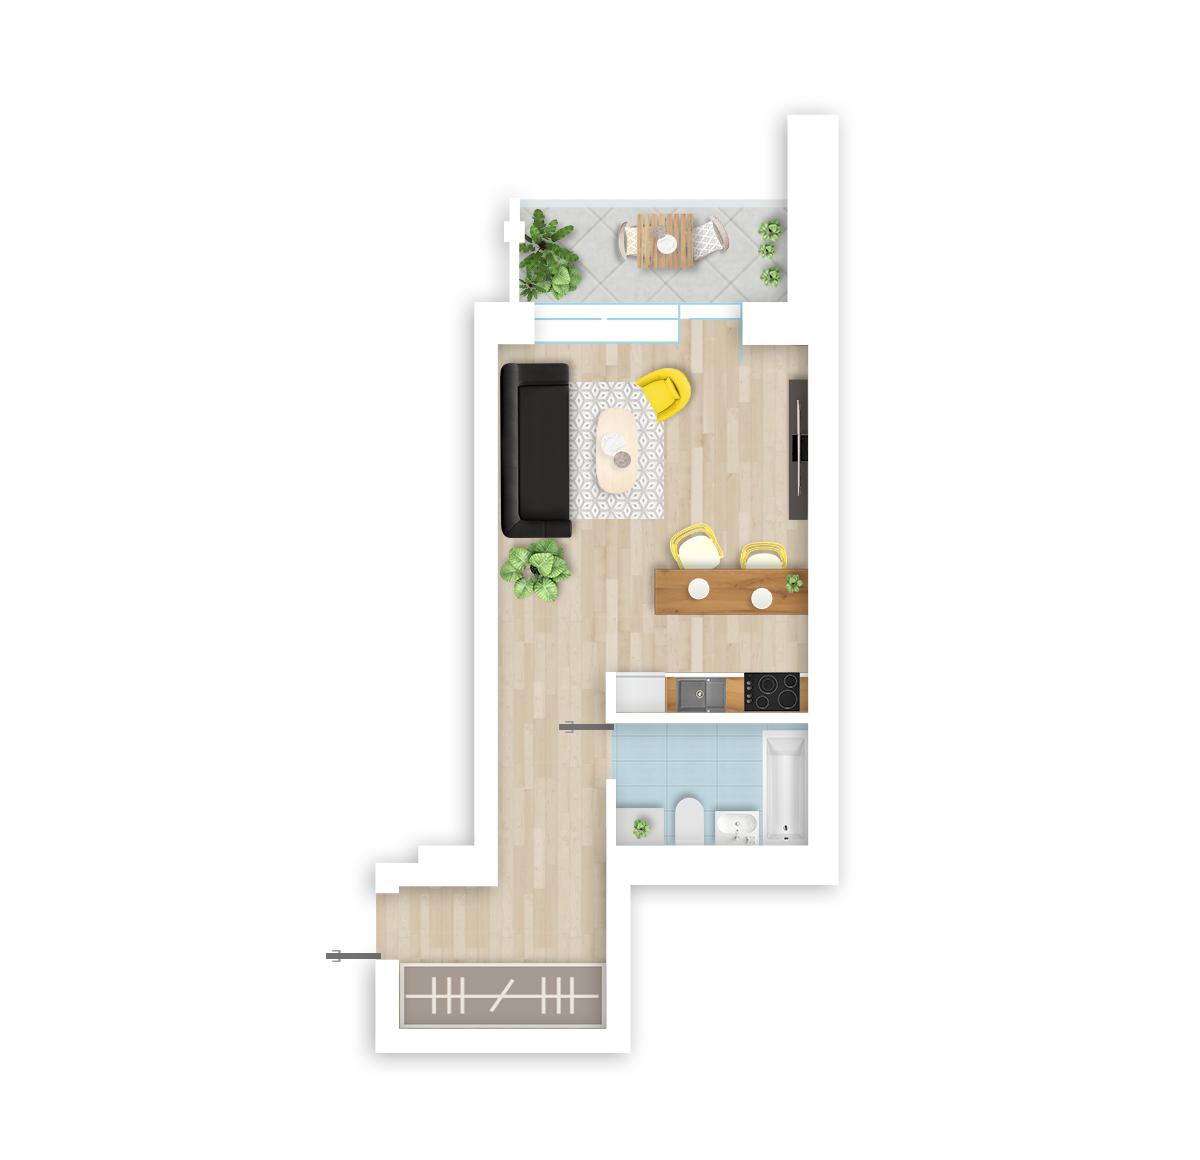 parduodamas butas Lietaus g. 4 - 5 Vilniuje, buto 3D vaizdas